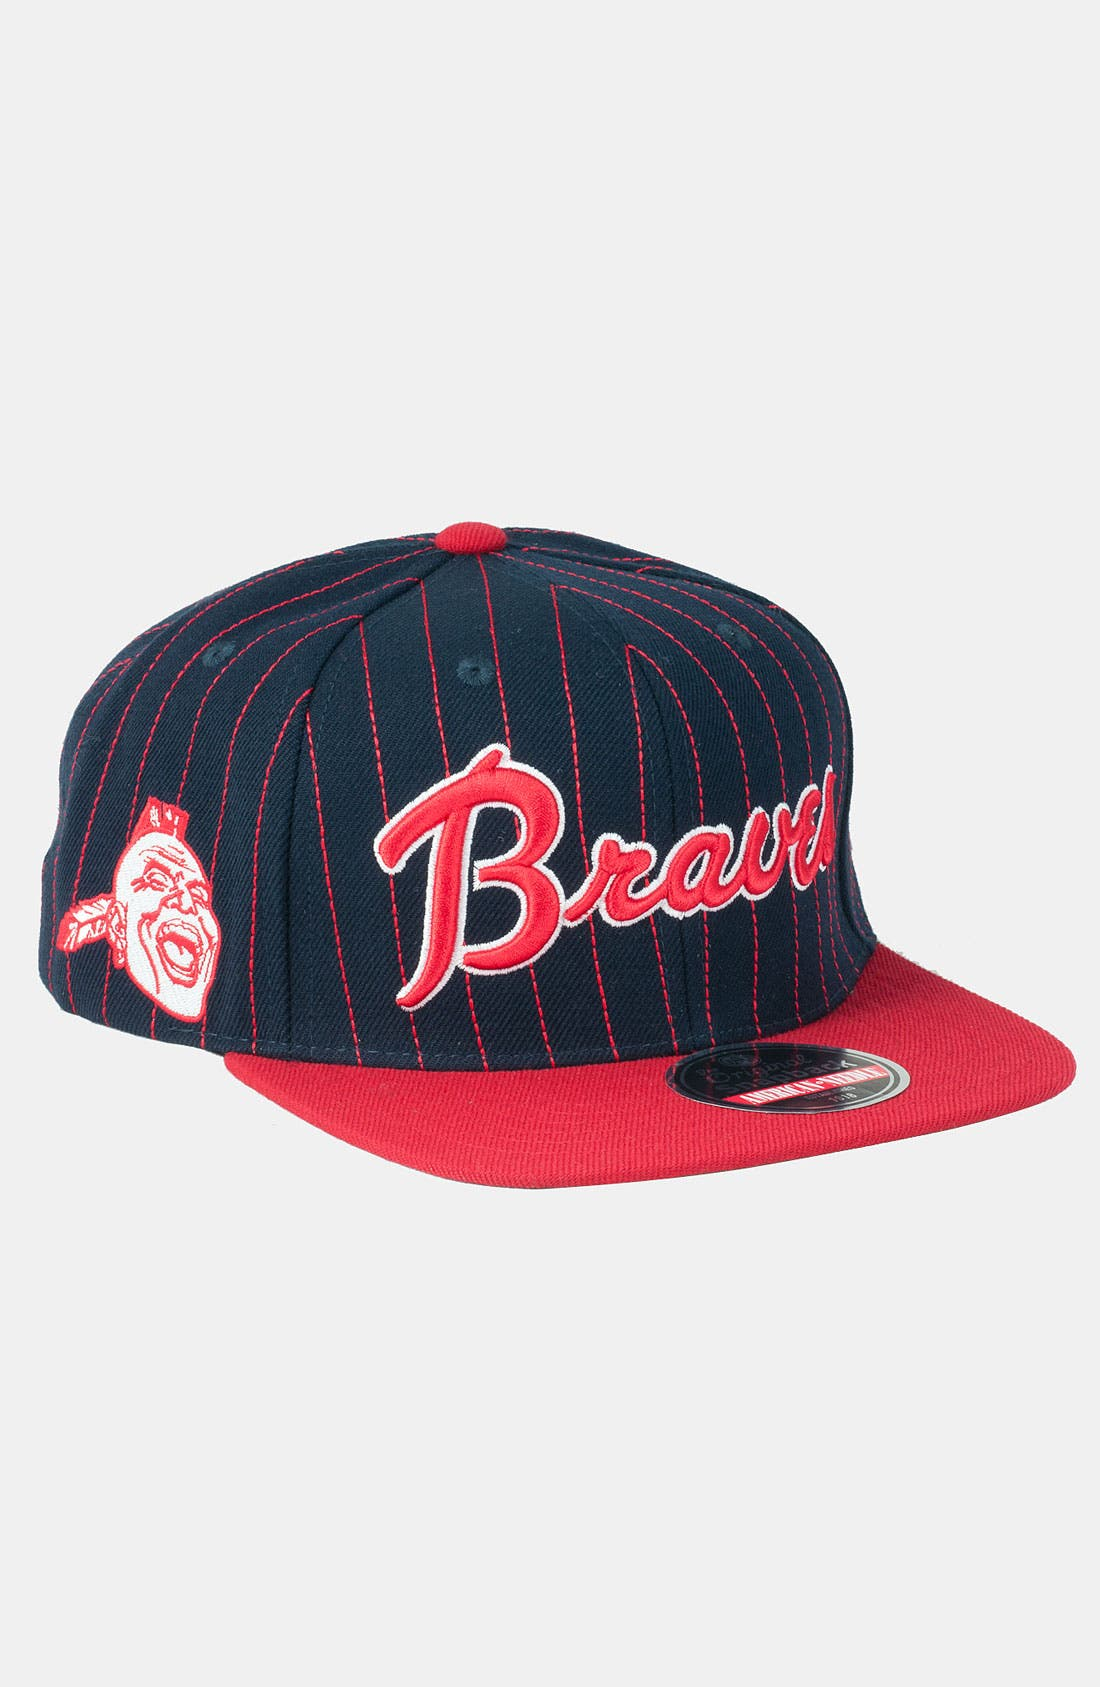 Main Image - American Needle 'Braves' Snapback Baseball Cap